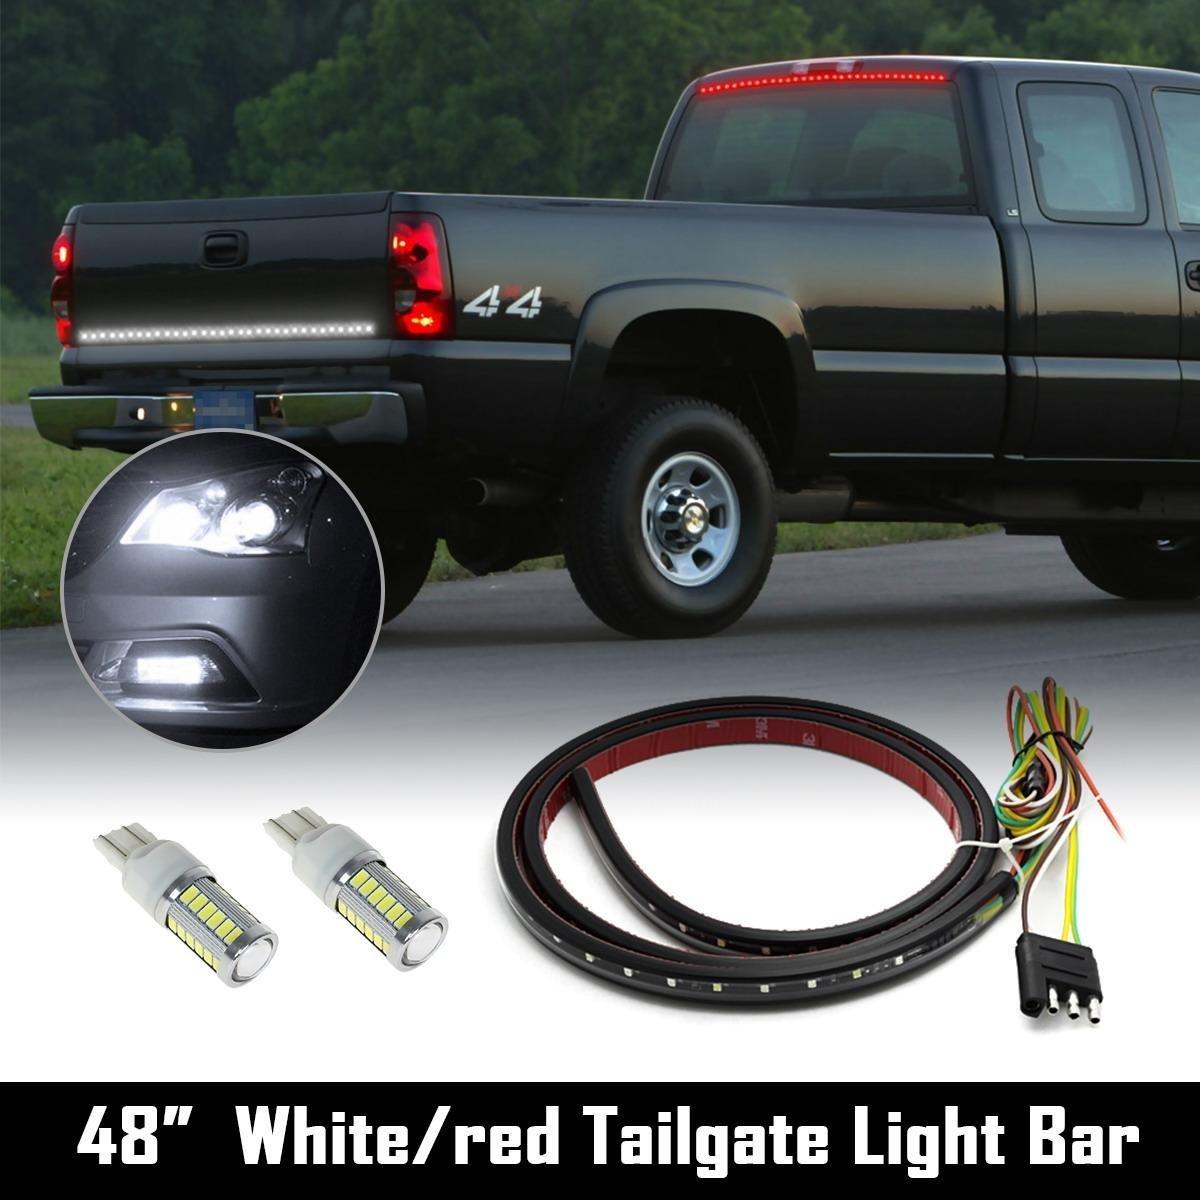 "Partsam 48"" Tail/Brake/Signal LED TAILGATE LIGHT BAR STRIP SUV RV+7443 White LED Reverse"